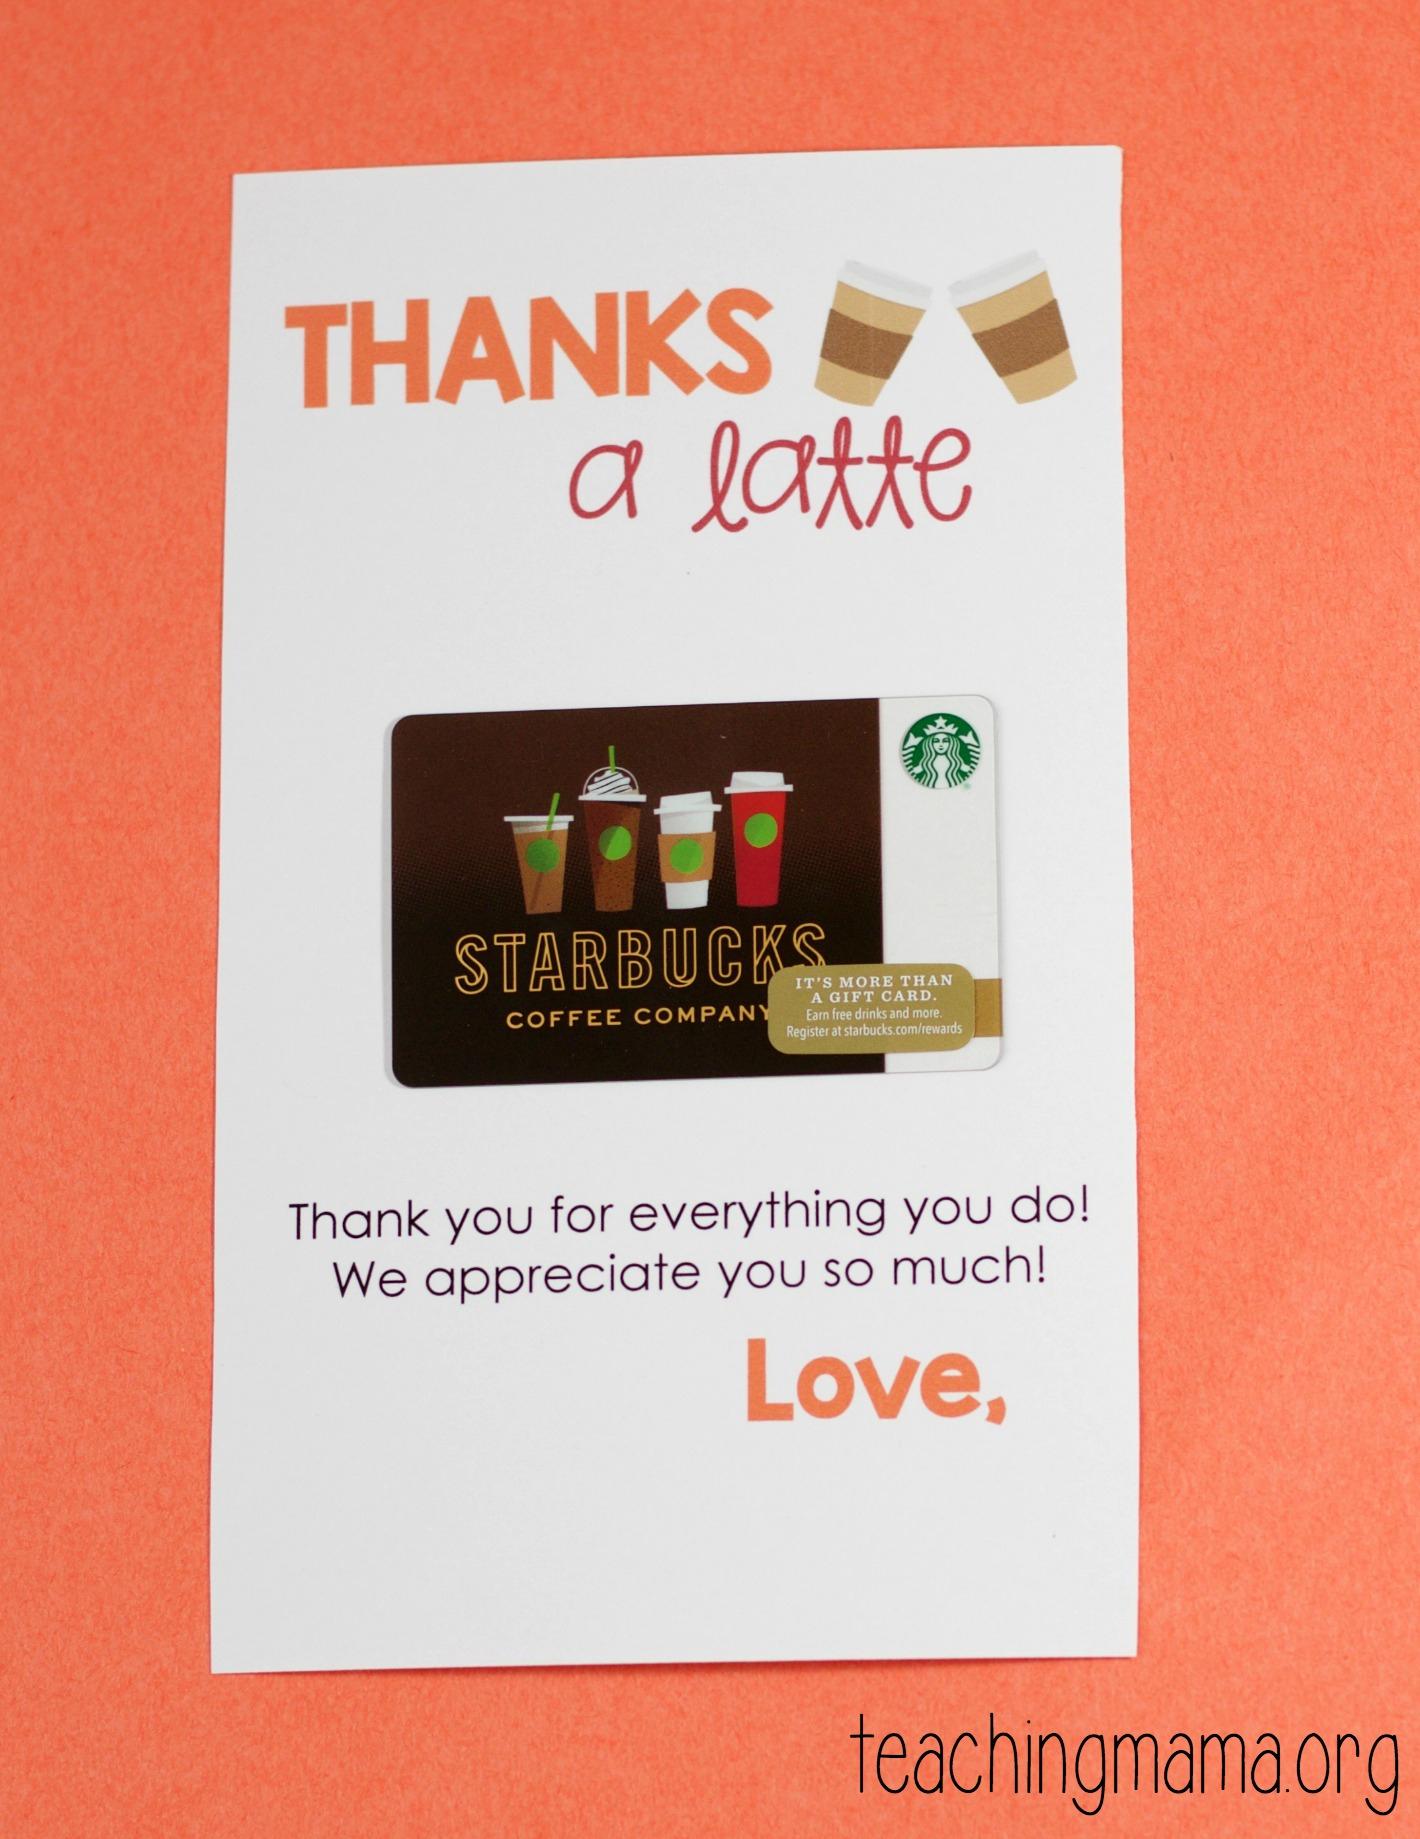 Thanks A Latte Printable - Thanks A Latte Free Printable Card